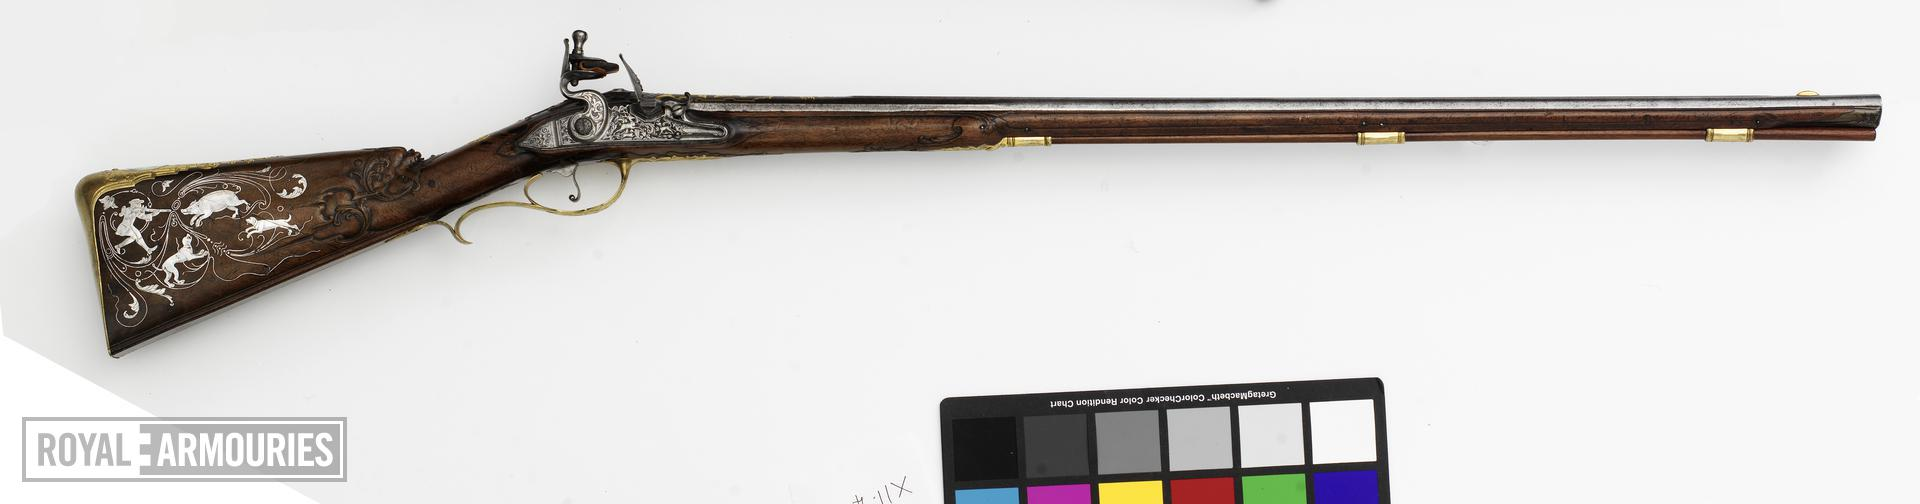 Flintlock boy's gun - By S. Hauschka